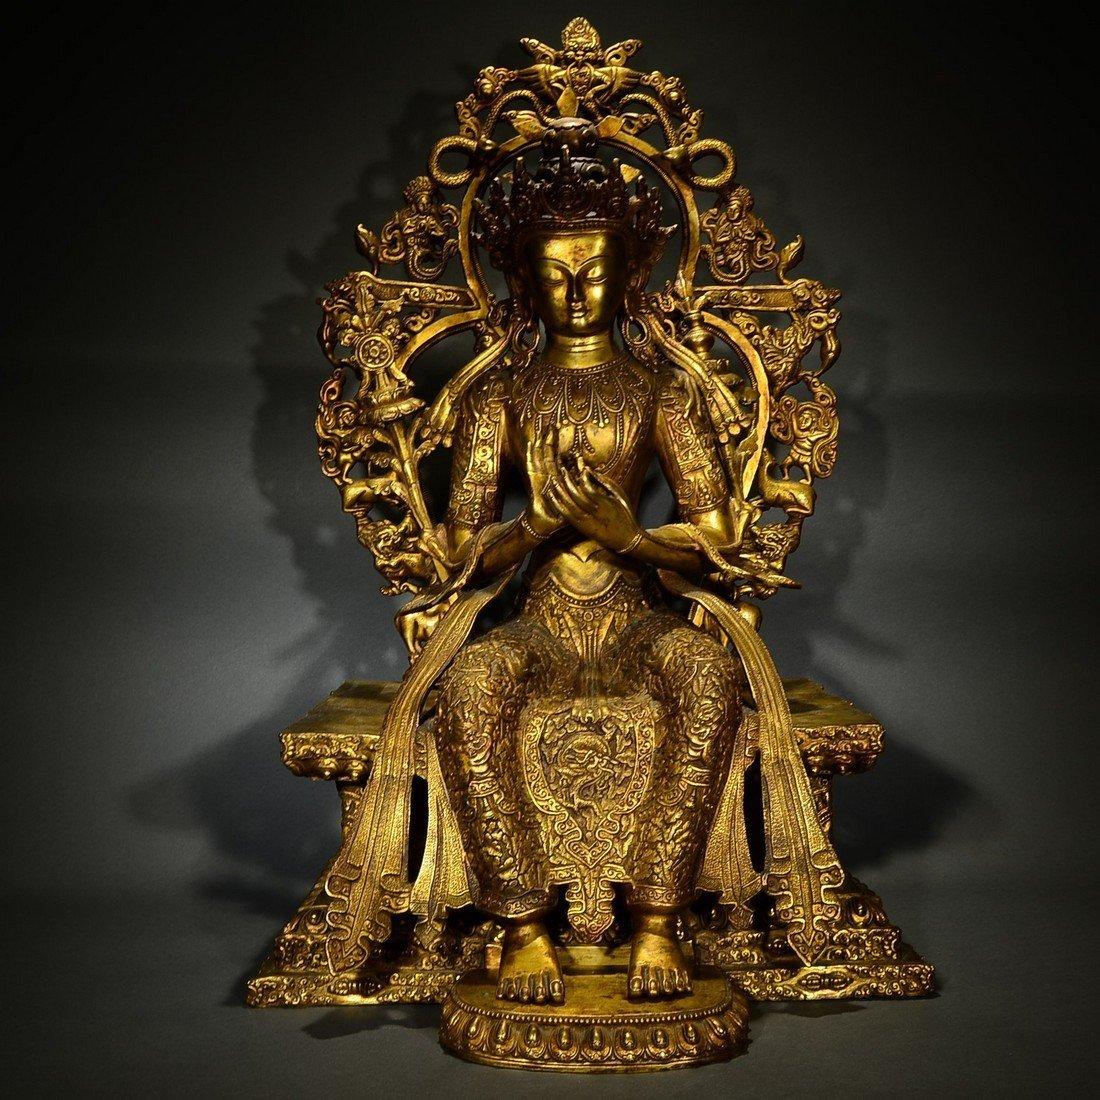 A Large Chinese Gilded Bronze Buddha Figure